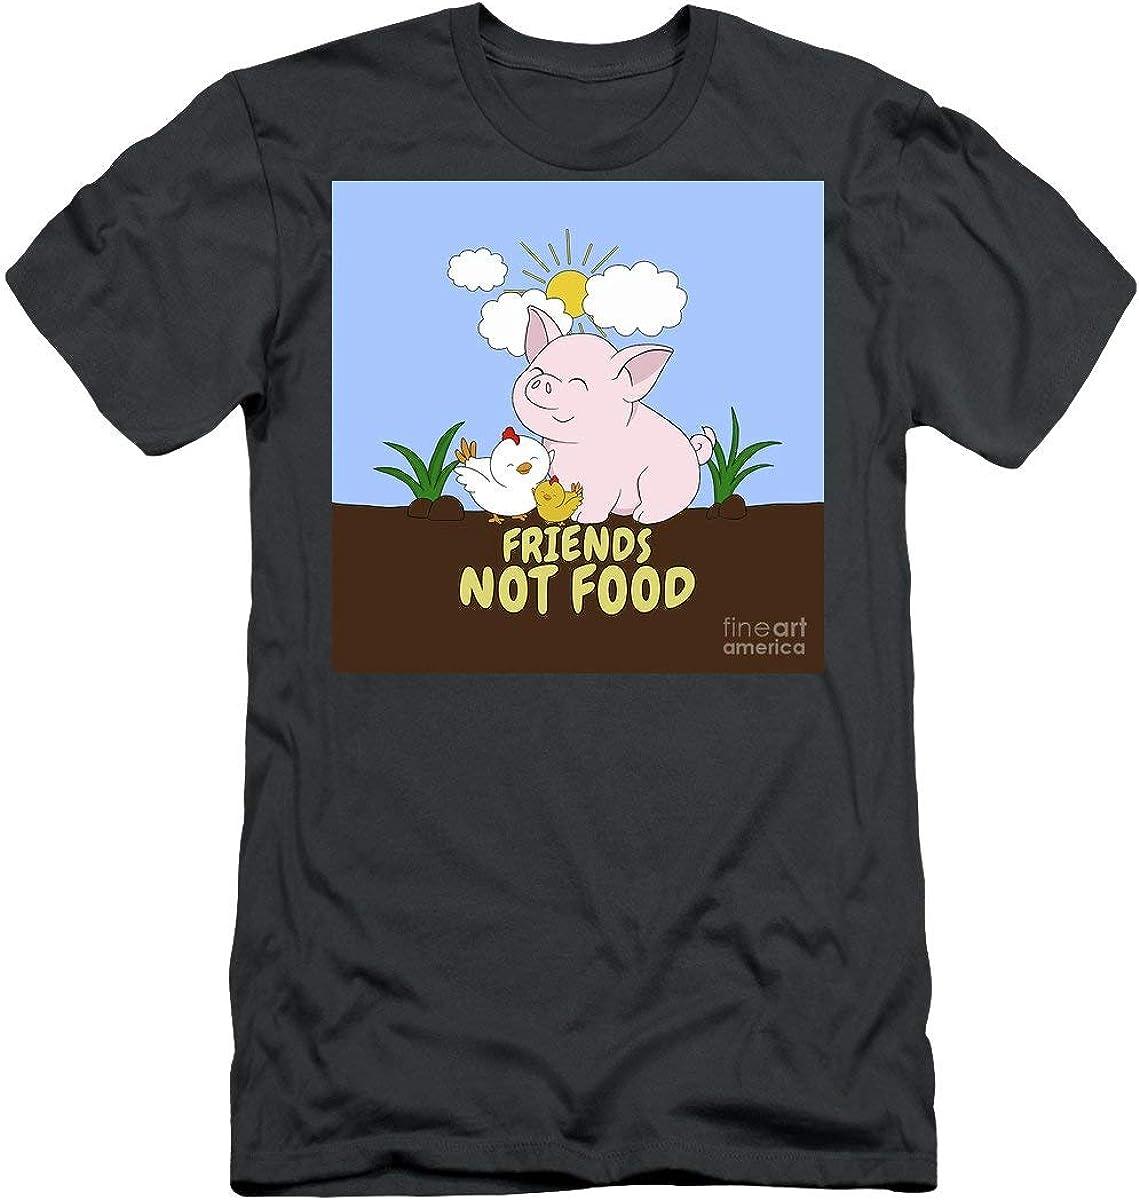 F_R_I_E_N_D_S Not Food Cute Pig and Chicken Tshirt